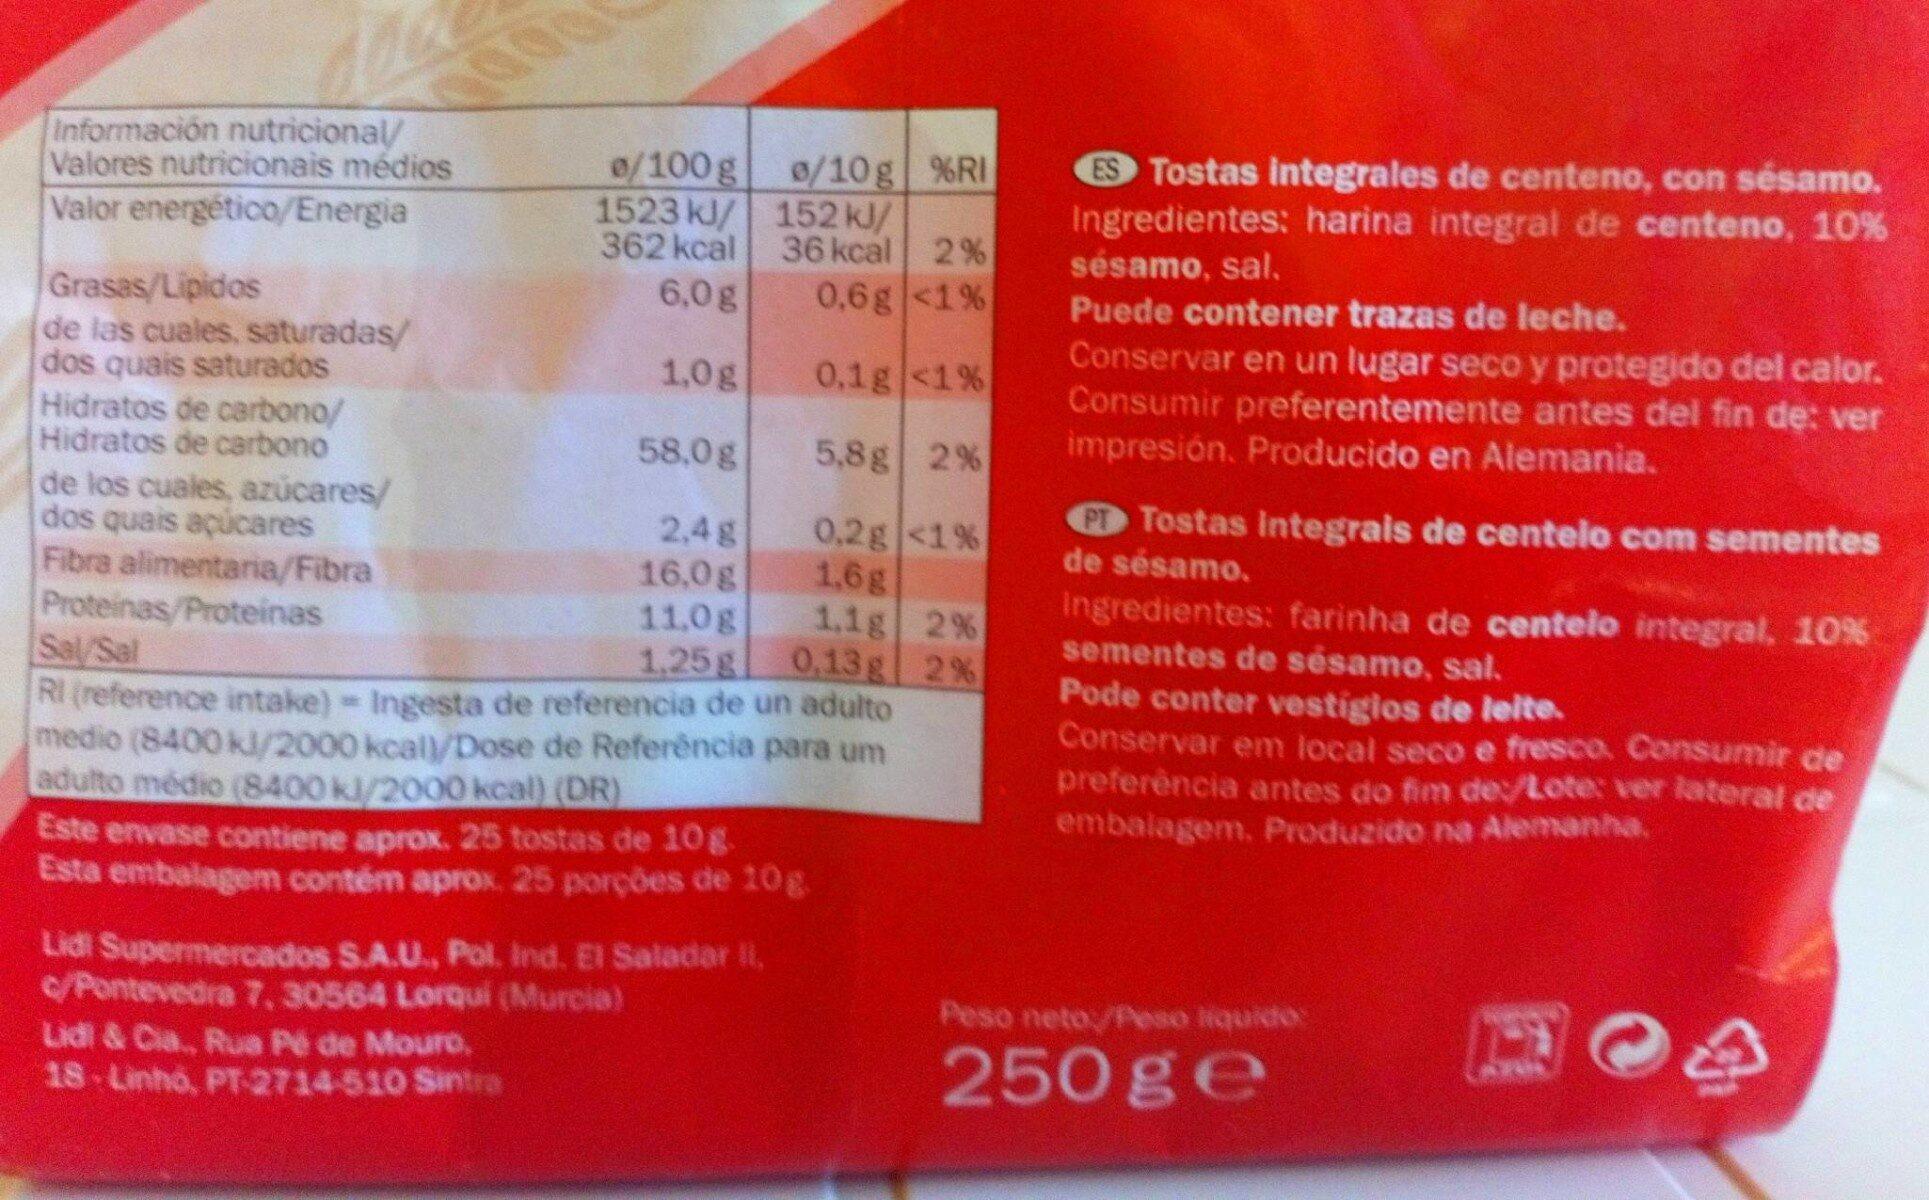 Tostas integrales de centeno con sesamo - Informations nutritionnelles